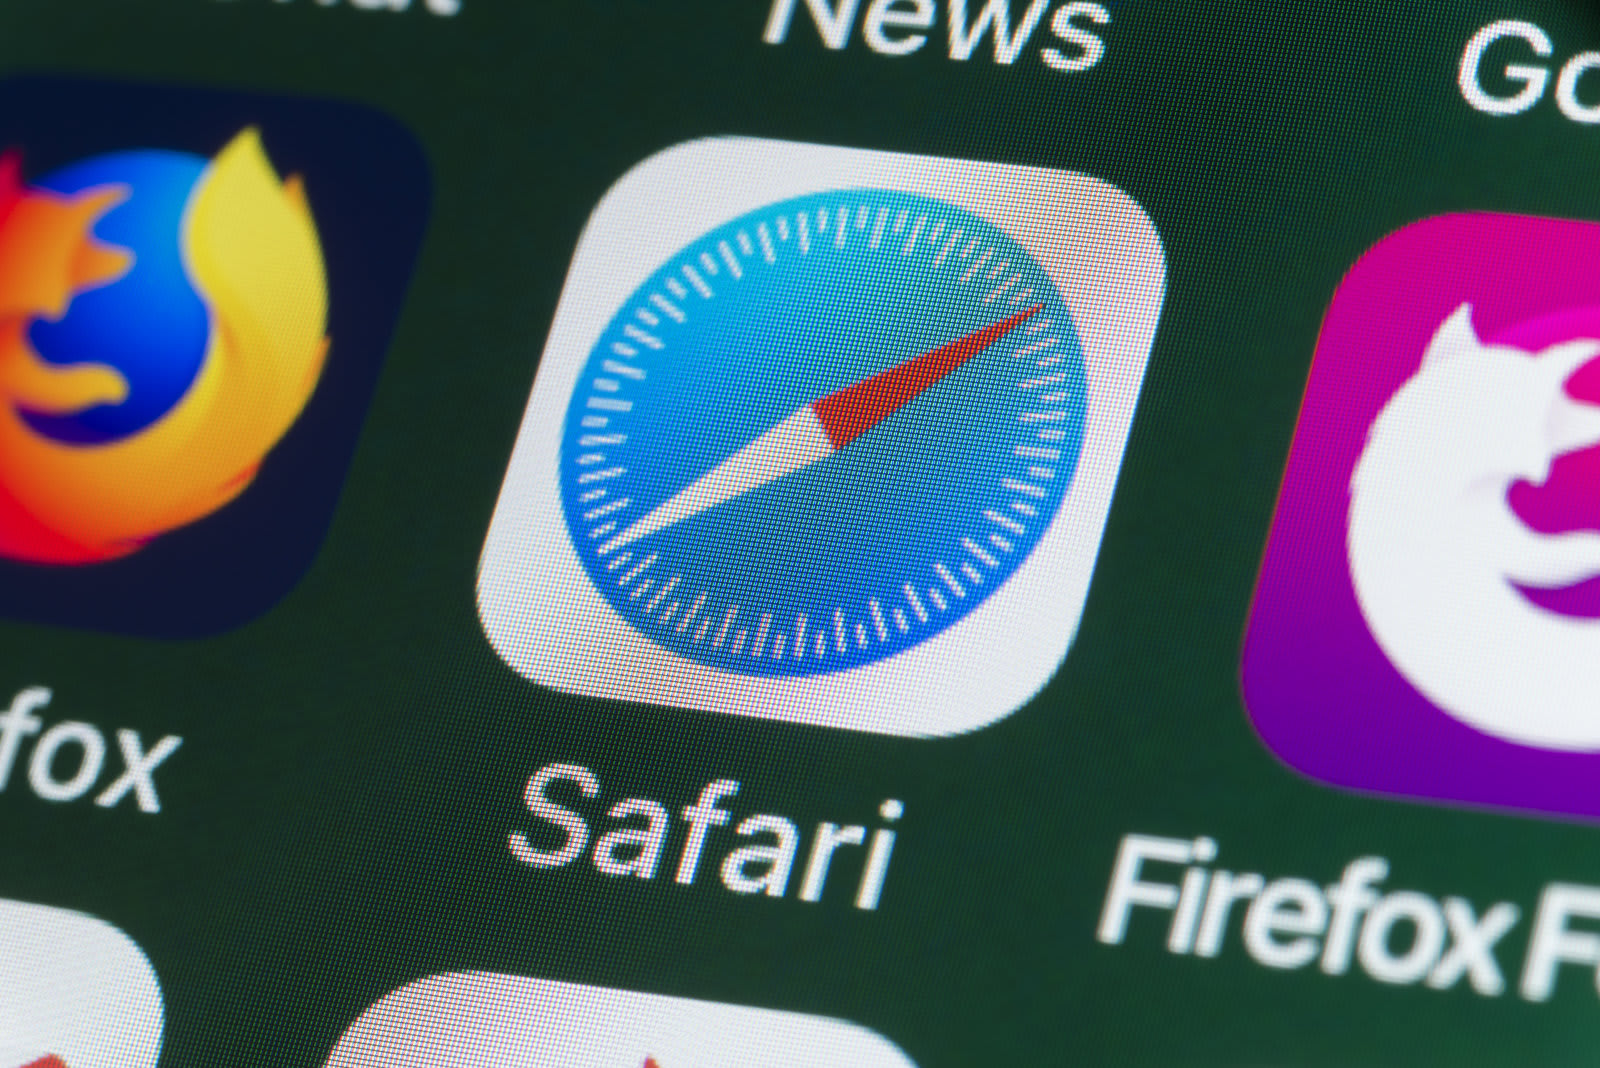 Apple promises hostile treatment for sites that break Safari privacy rules